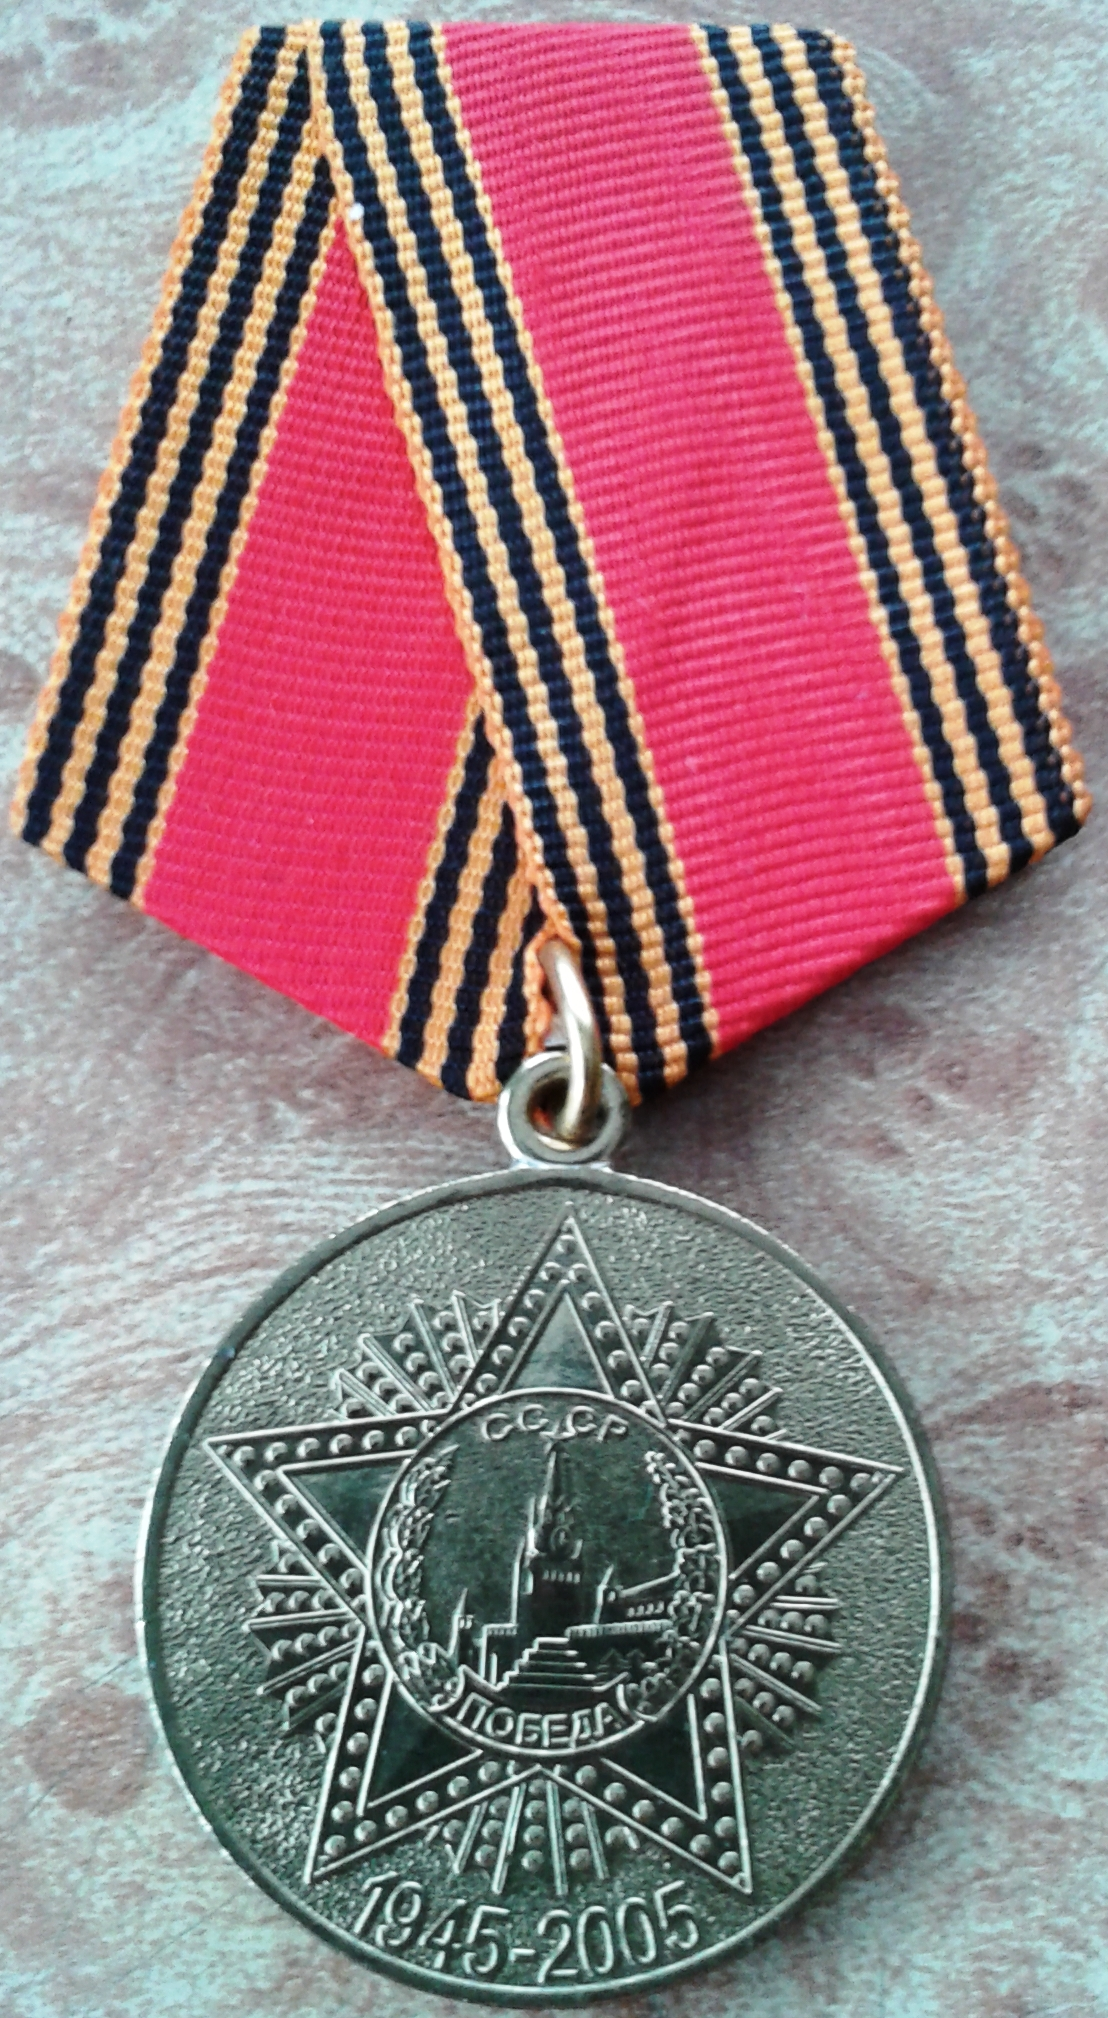 137. Медаль 60 лет Победы, Барыкина МГ, 2005